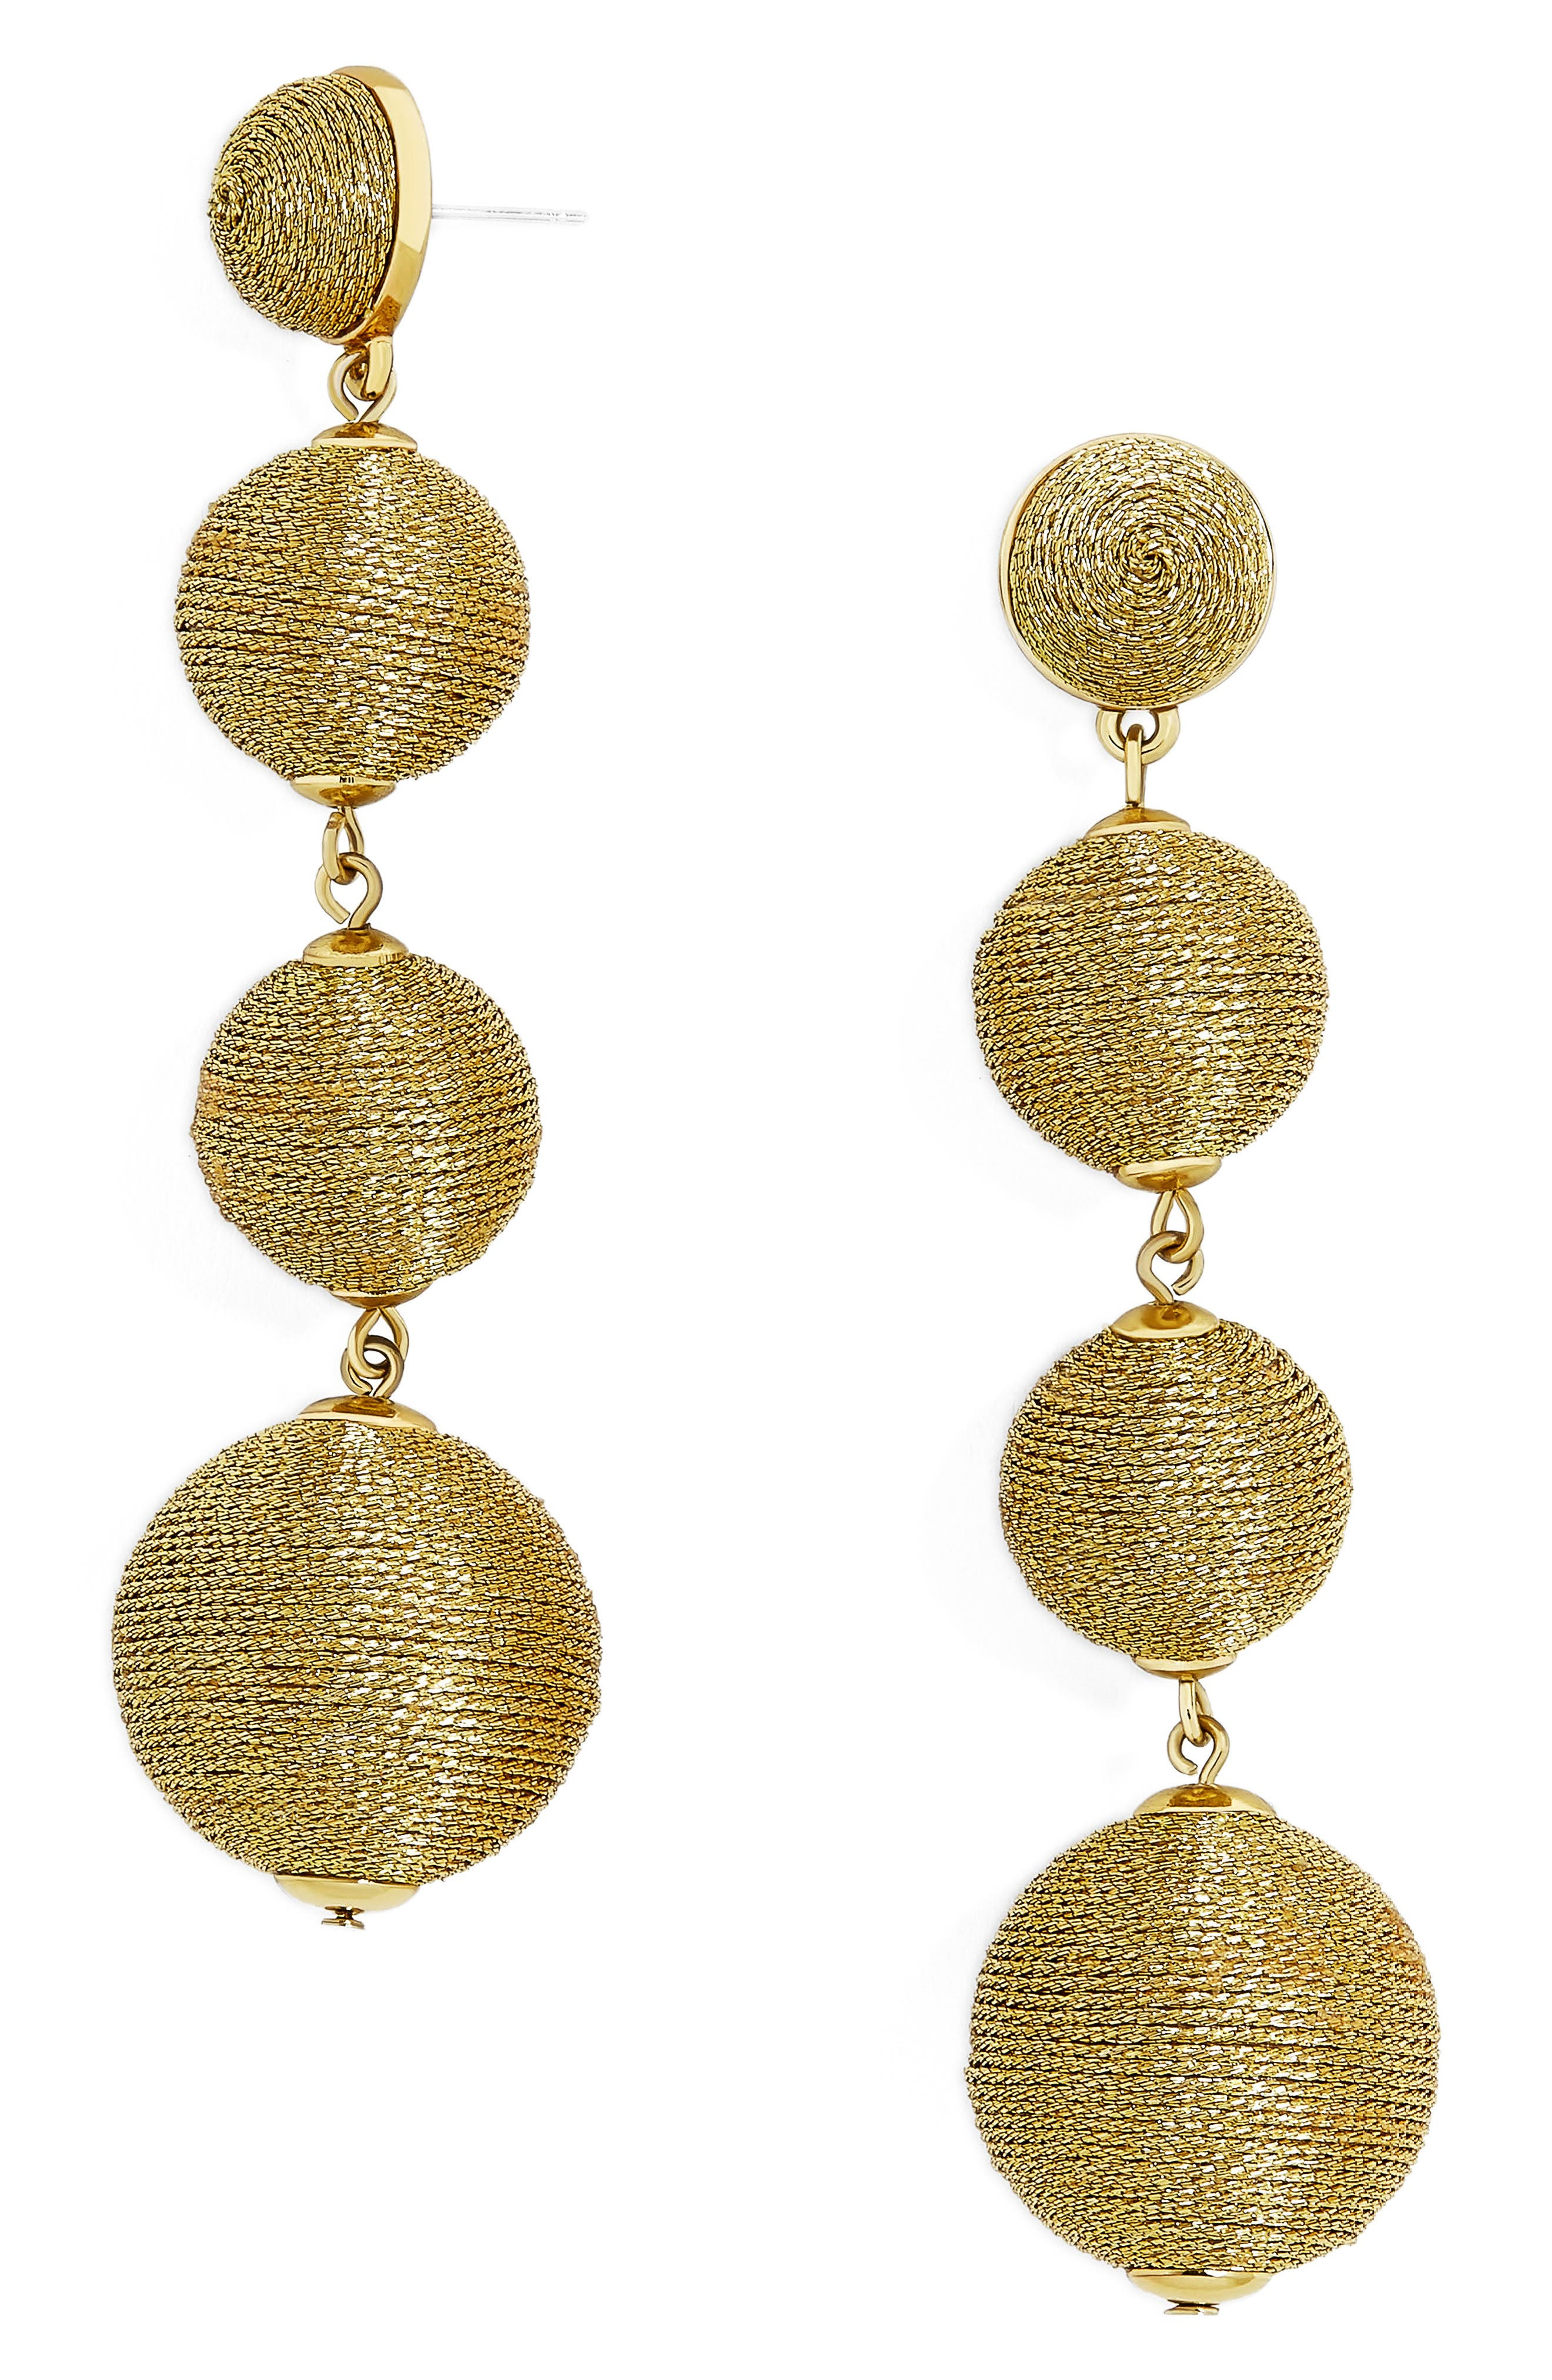 Criselda Ball Shoulder Duster Earrings,                             Main thumbnail 1, color,